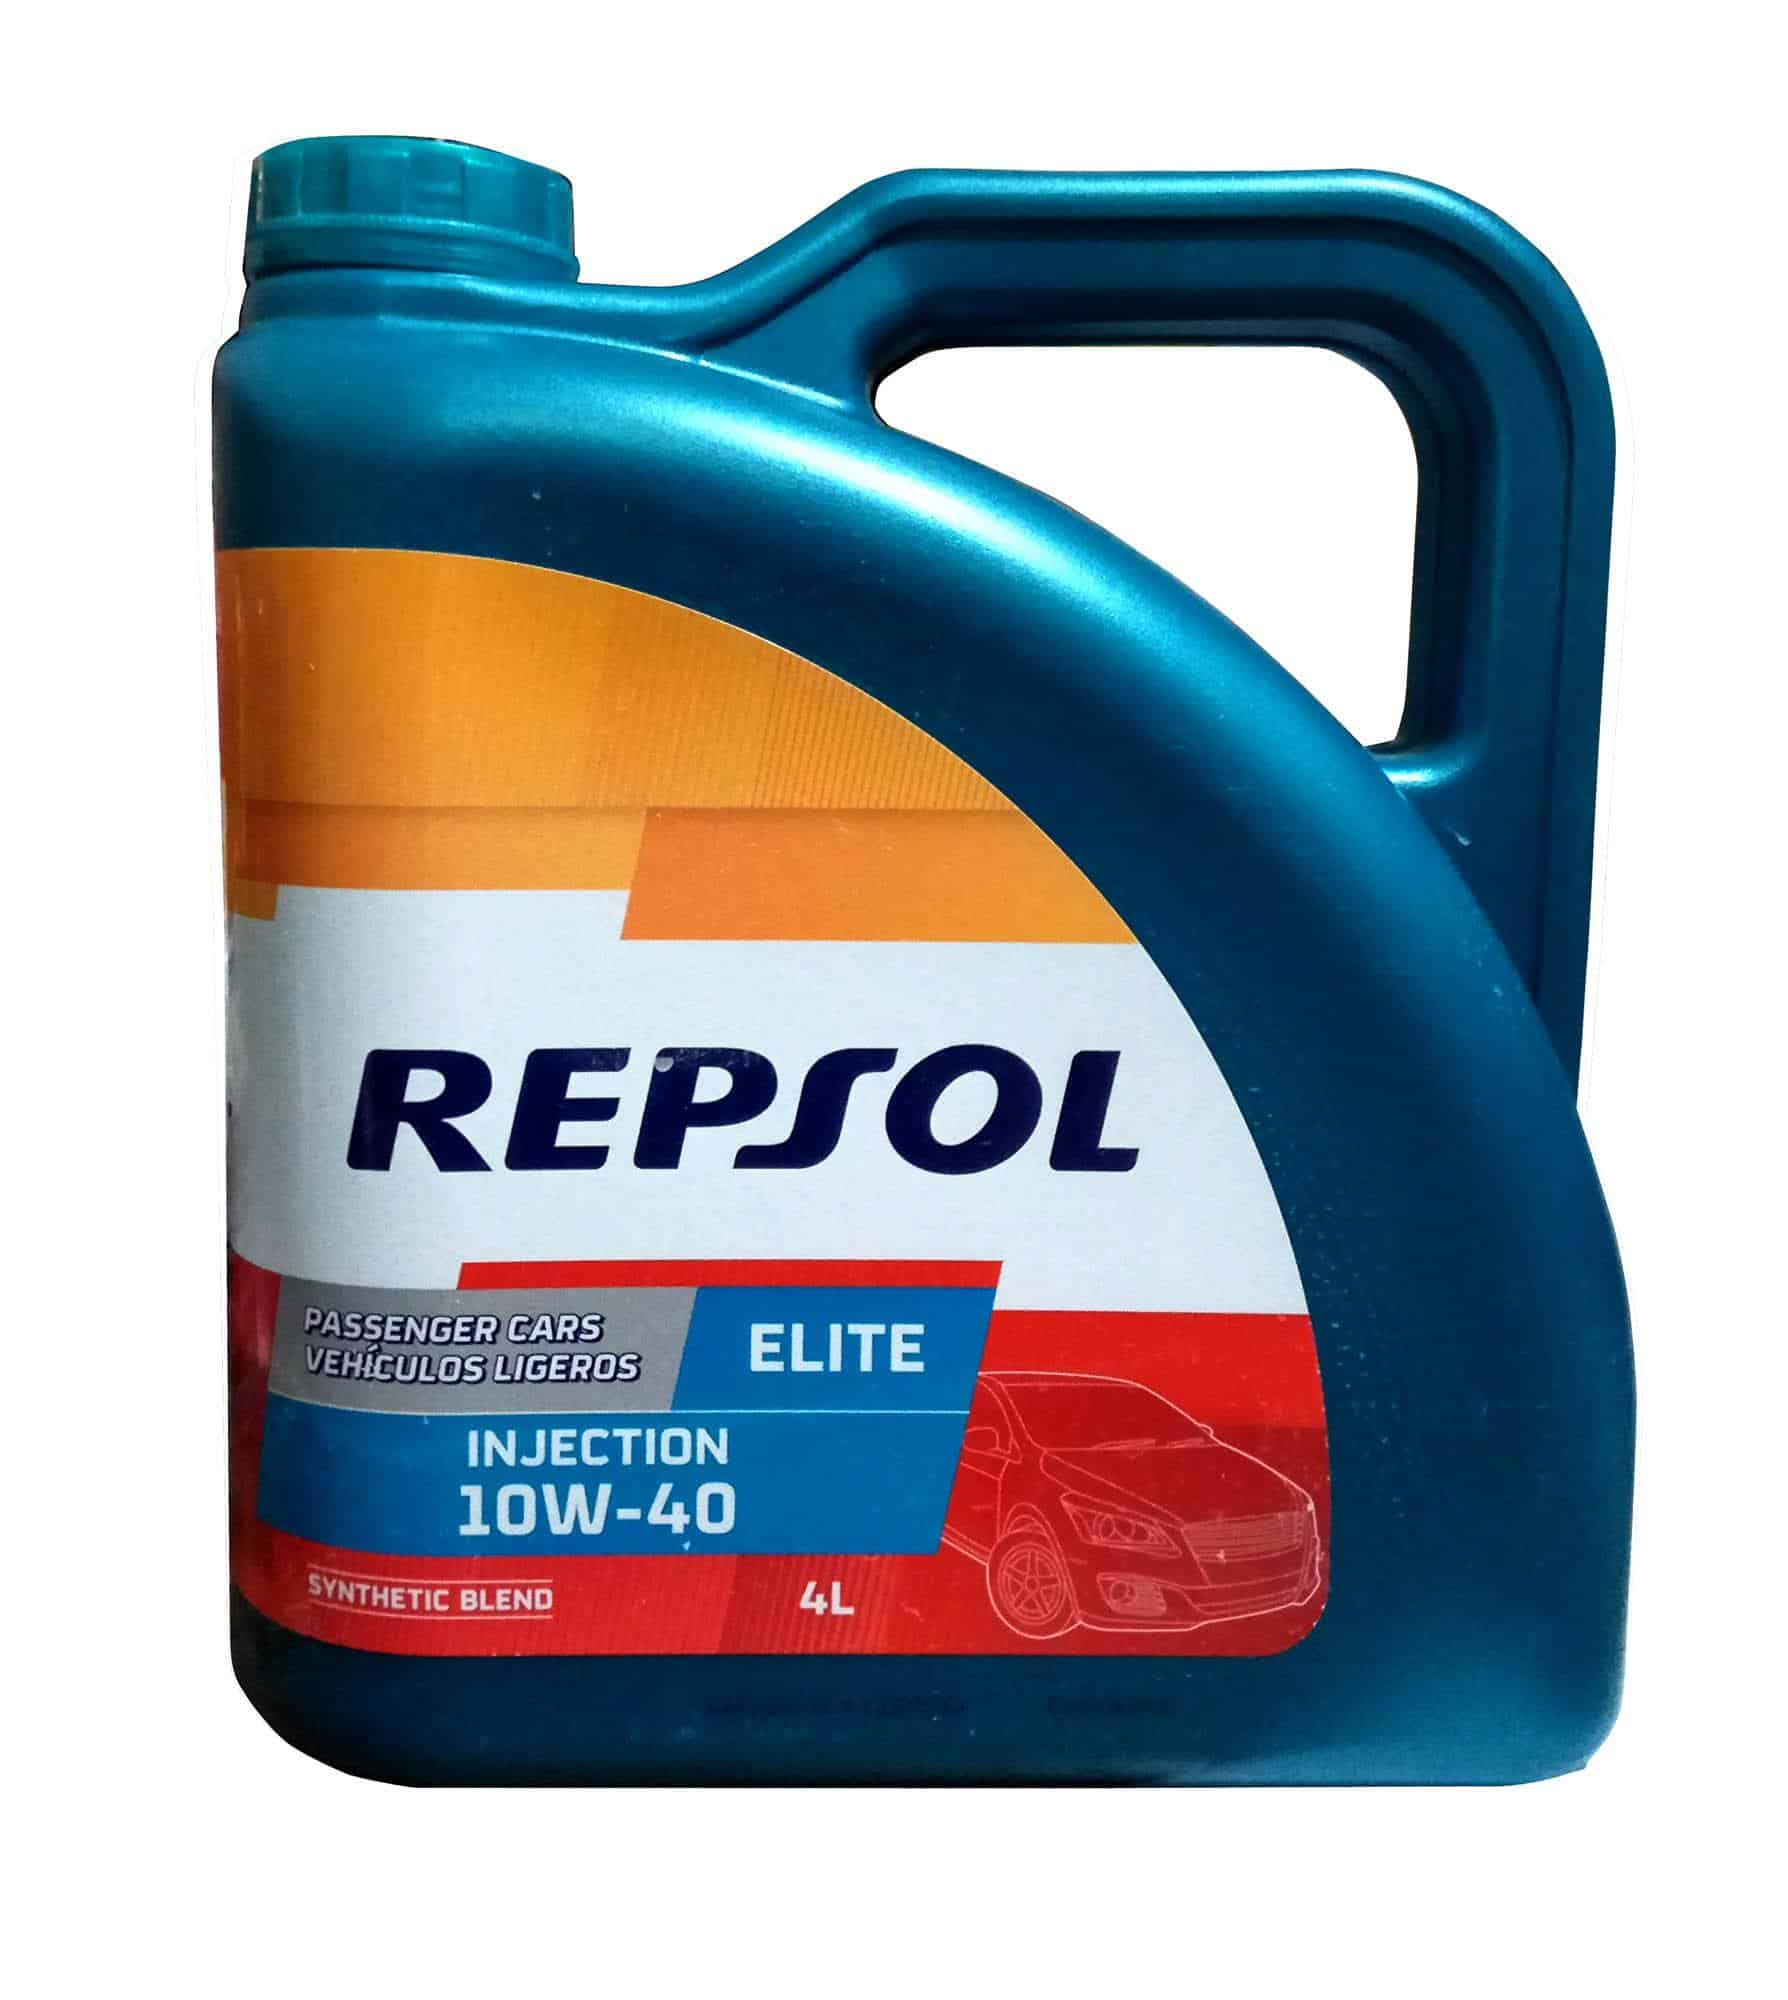 Repsol-Elite-Injection-10W-40